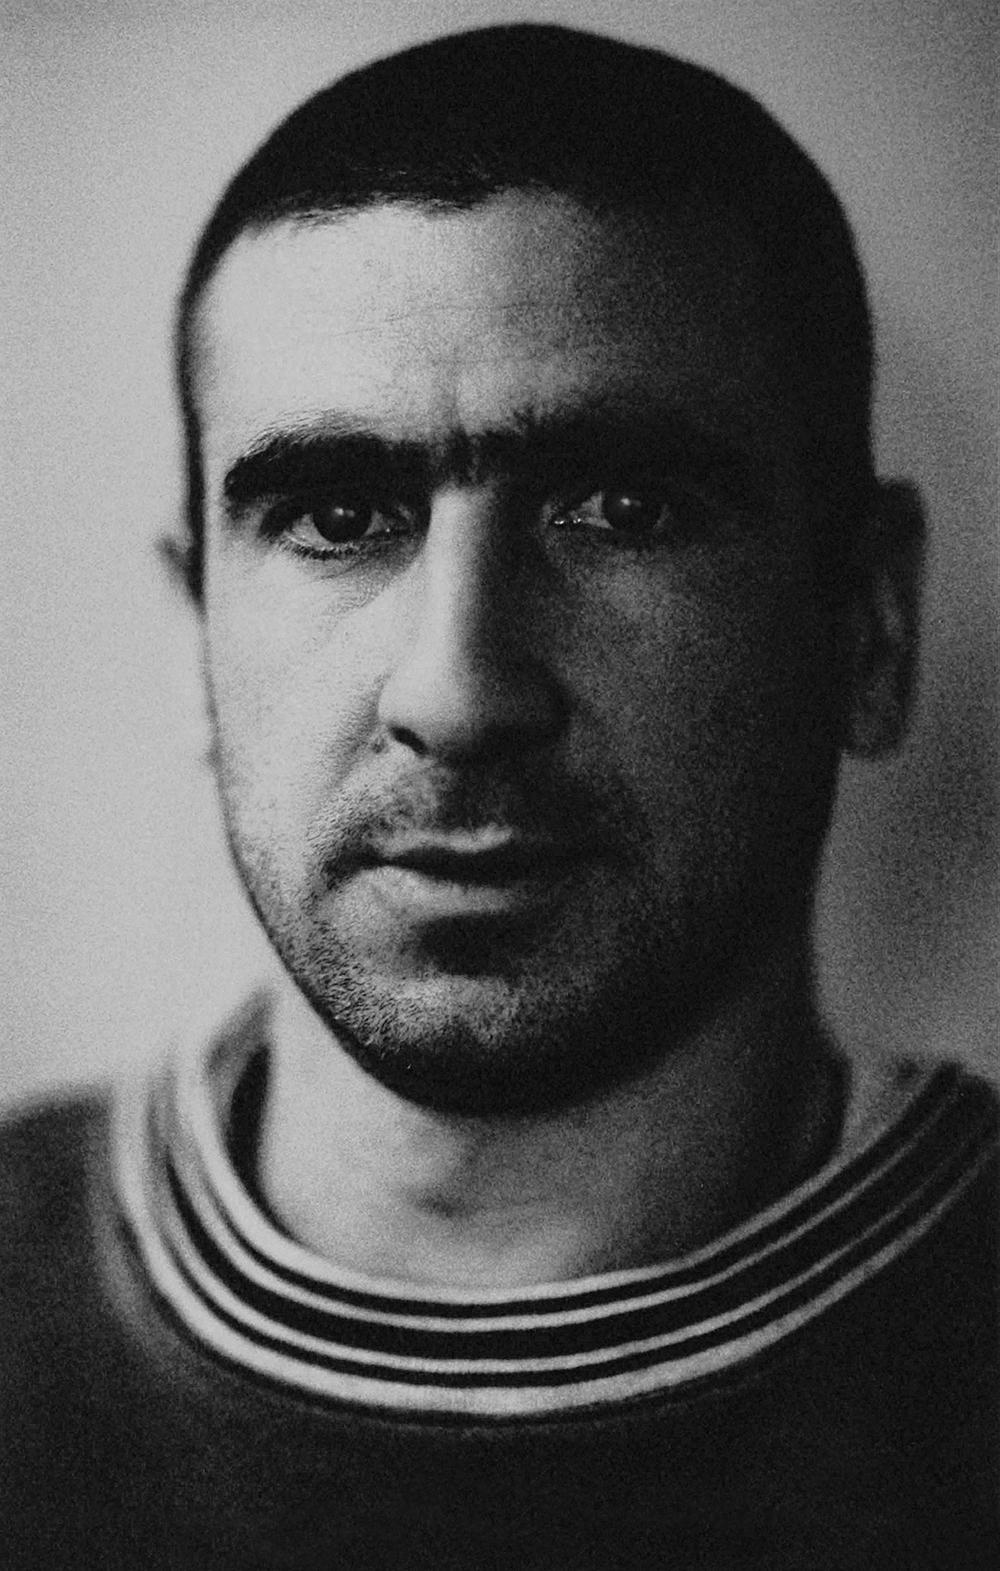 Cantona-by-philip-lane-photography